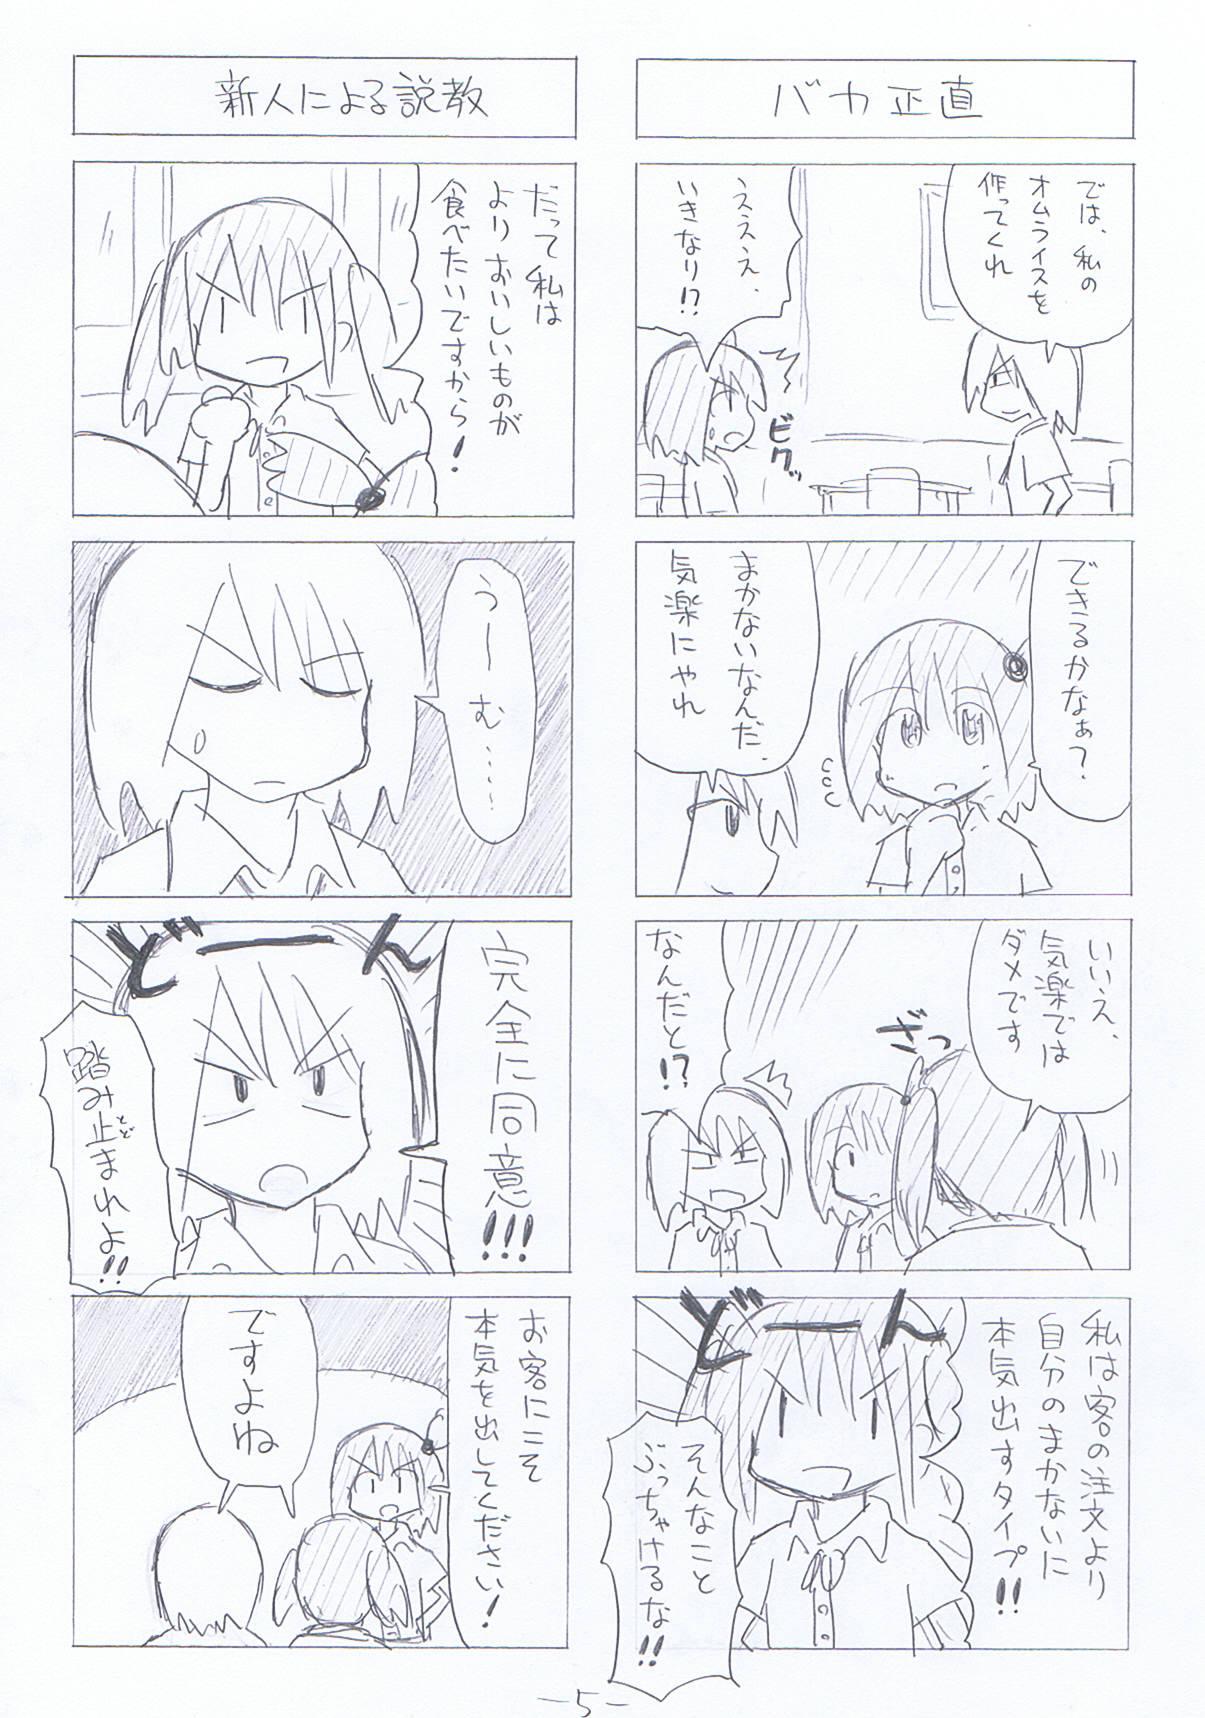 hitotoki-3-5.jpg